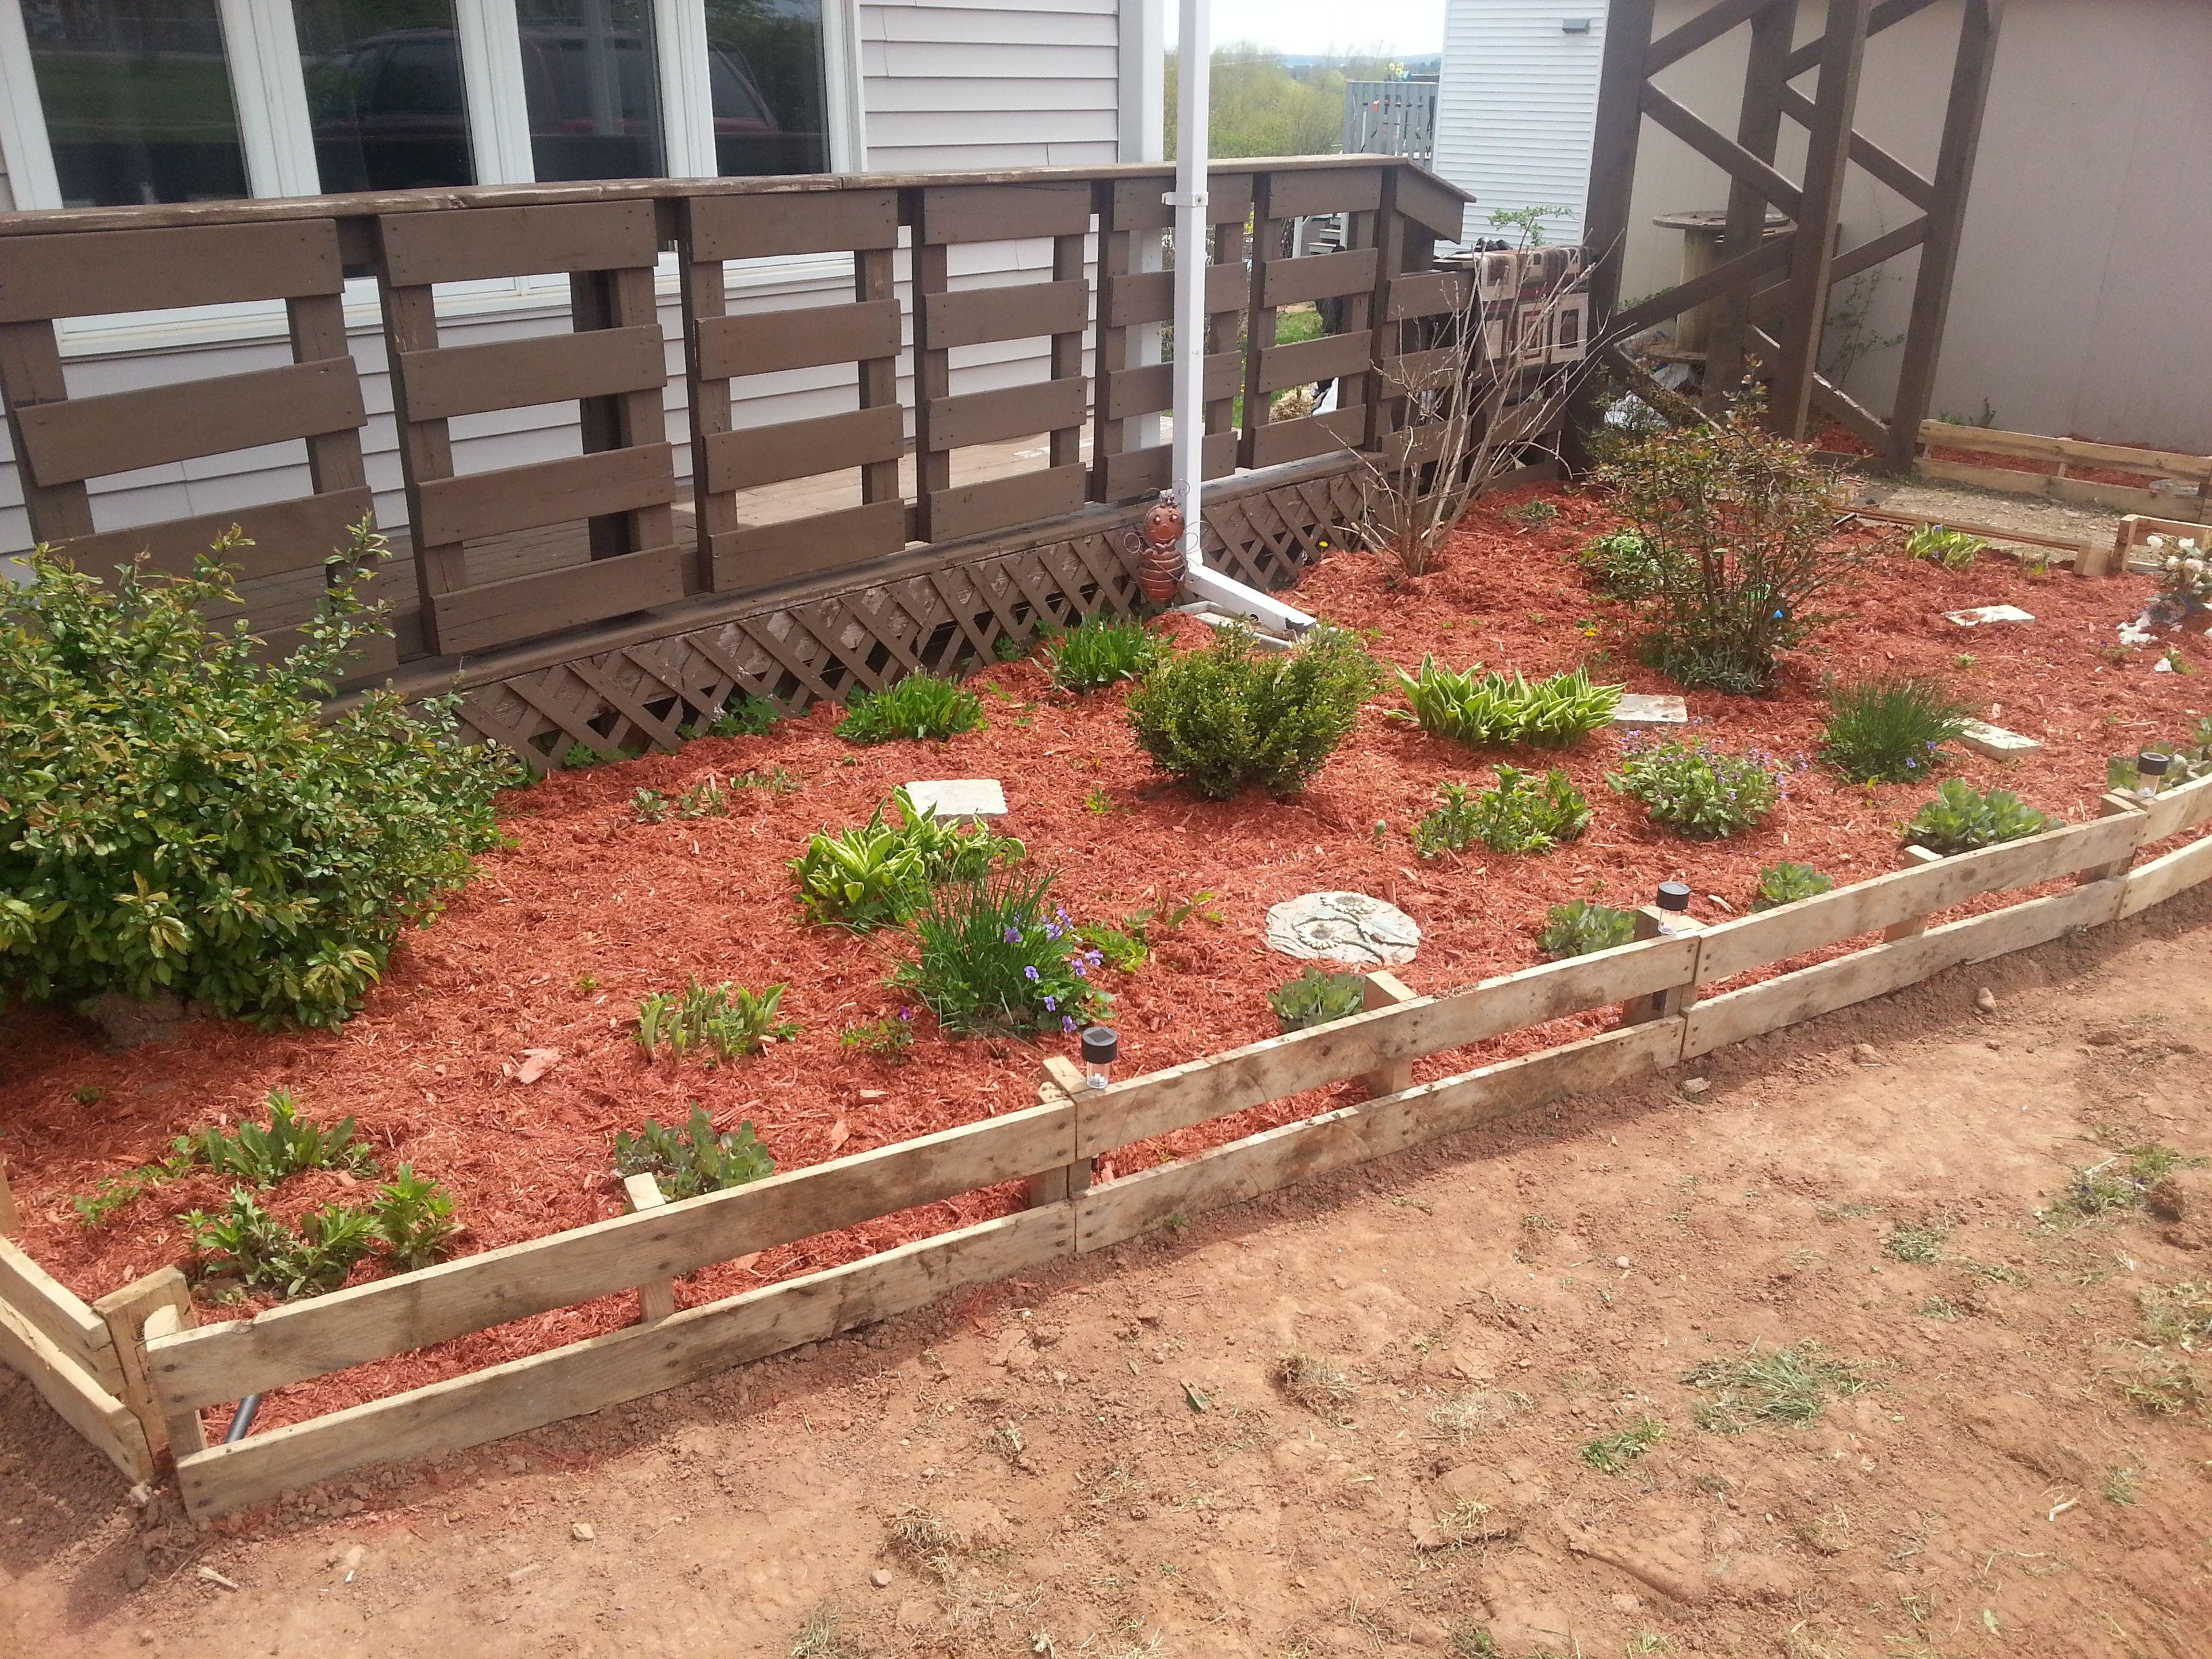 Pallet Garden Edge | Diy garden bed, Garden edging, Pallets garden